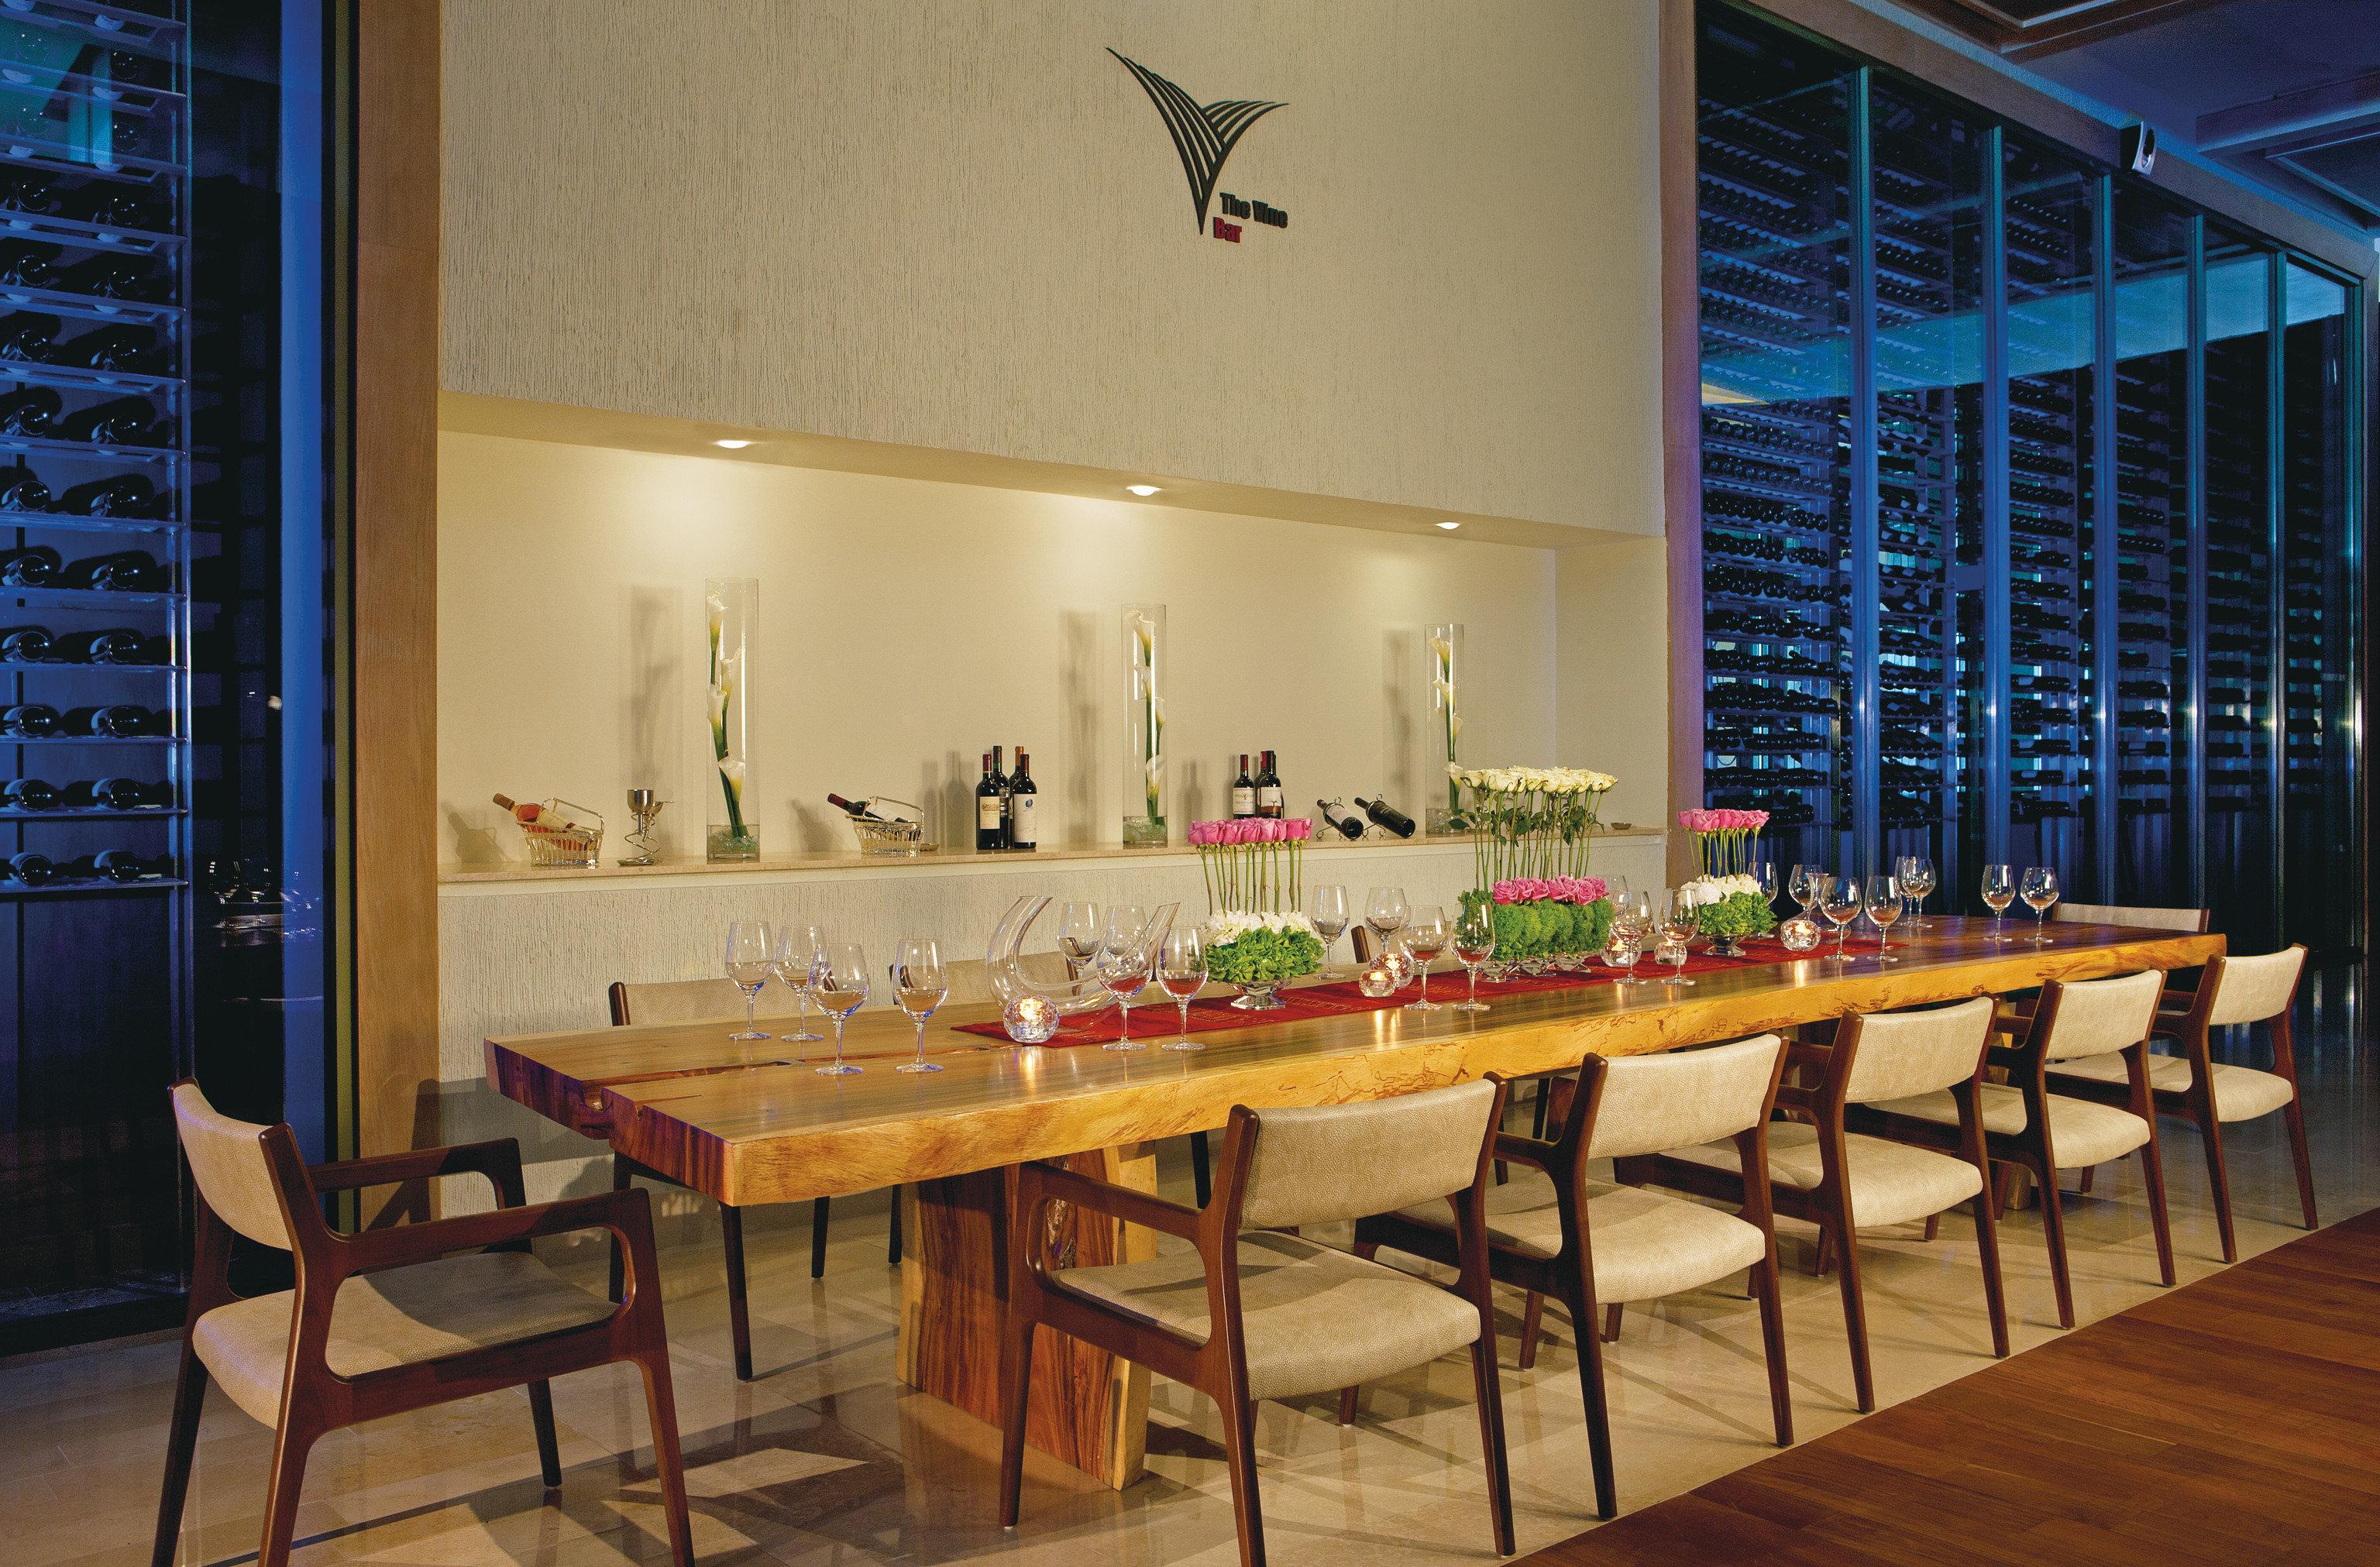 Hotels floor indoor room restaurant interior design dining room estate Bar Design